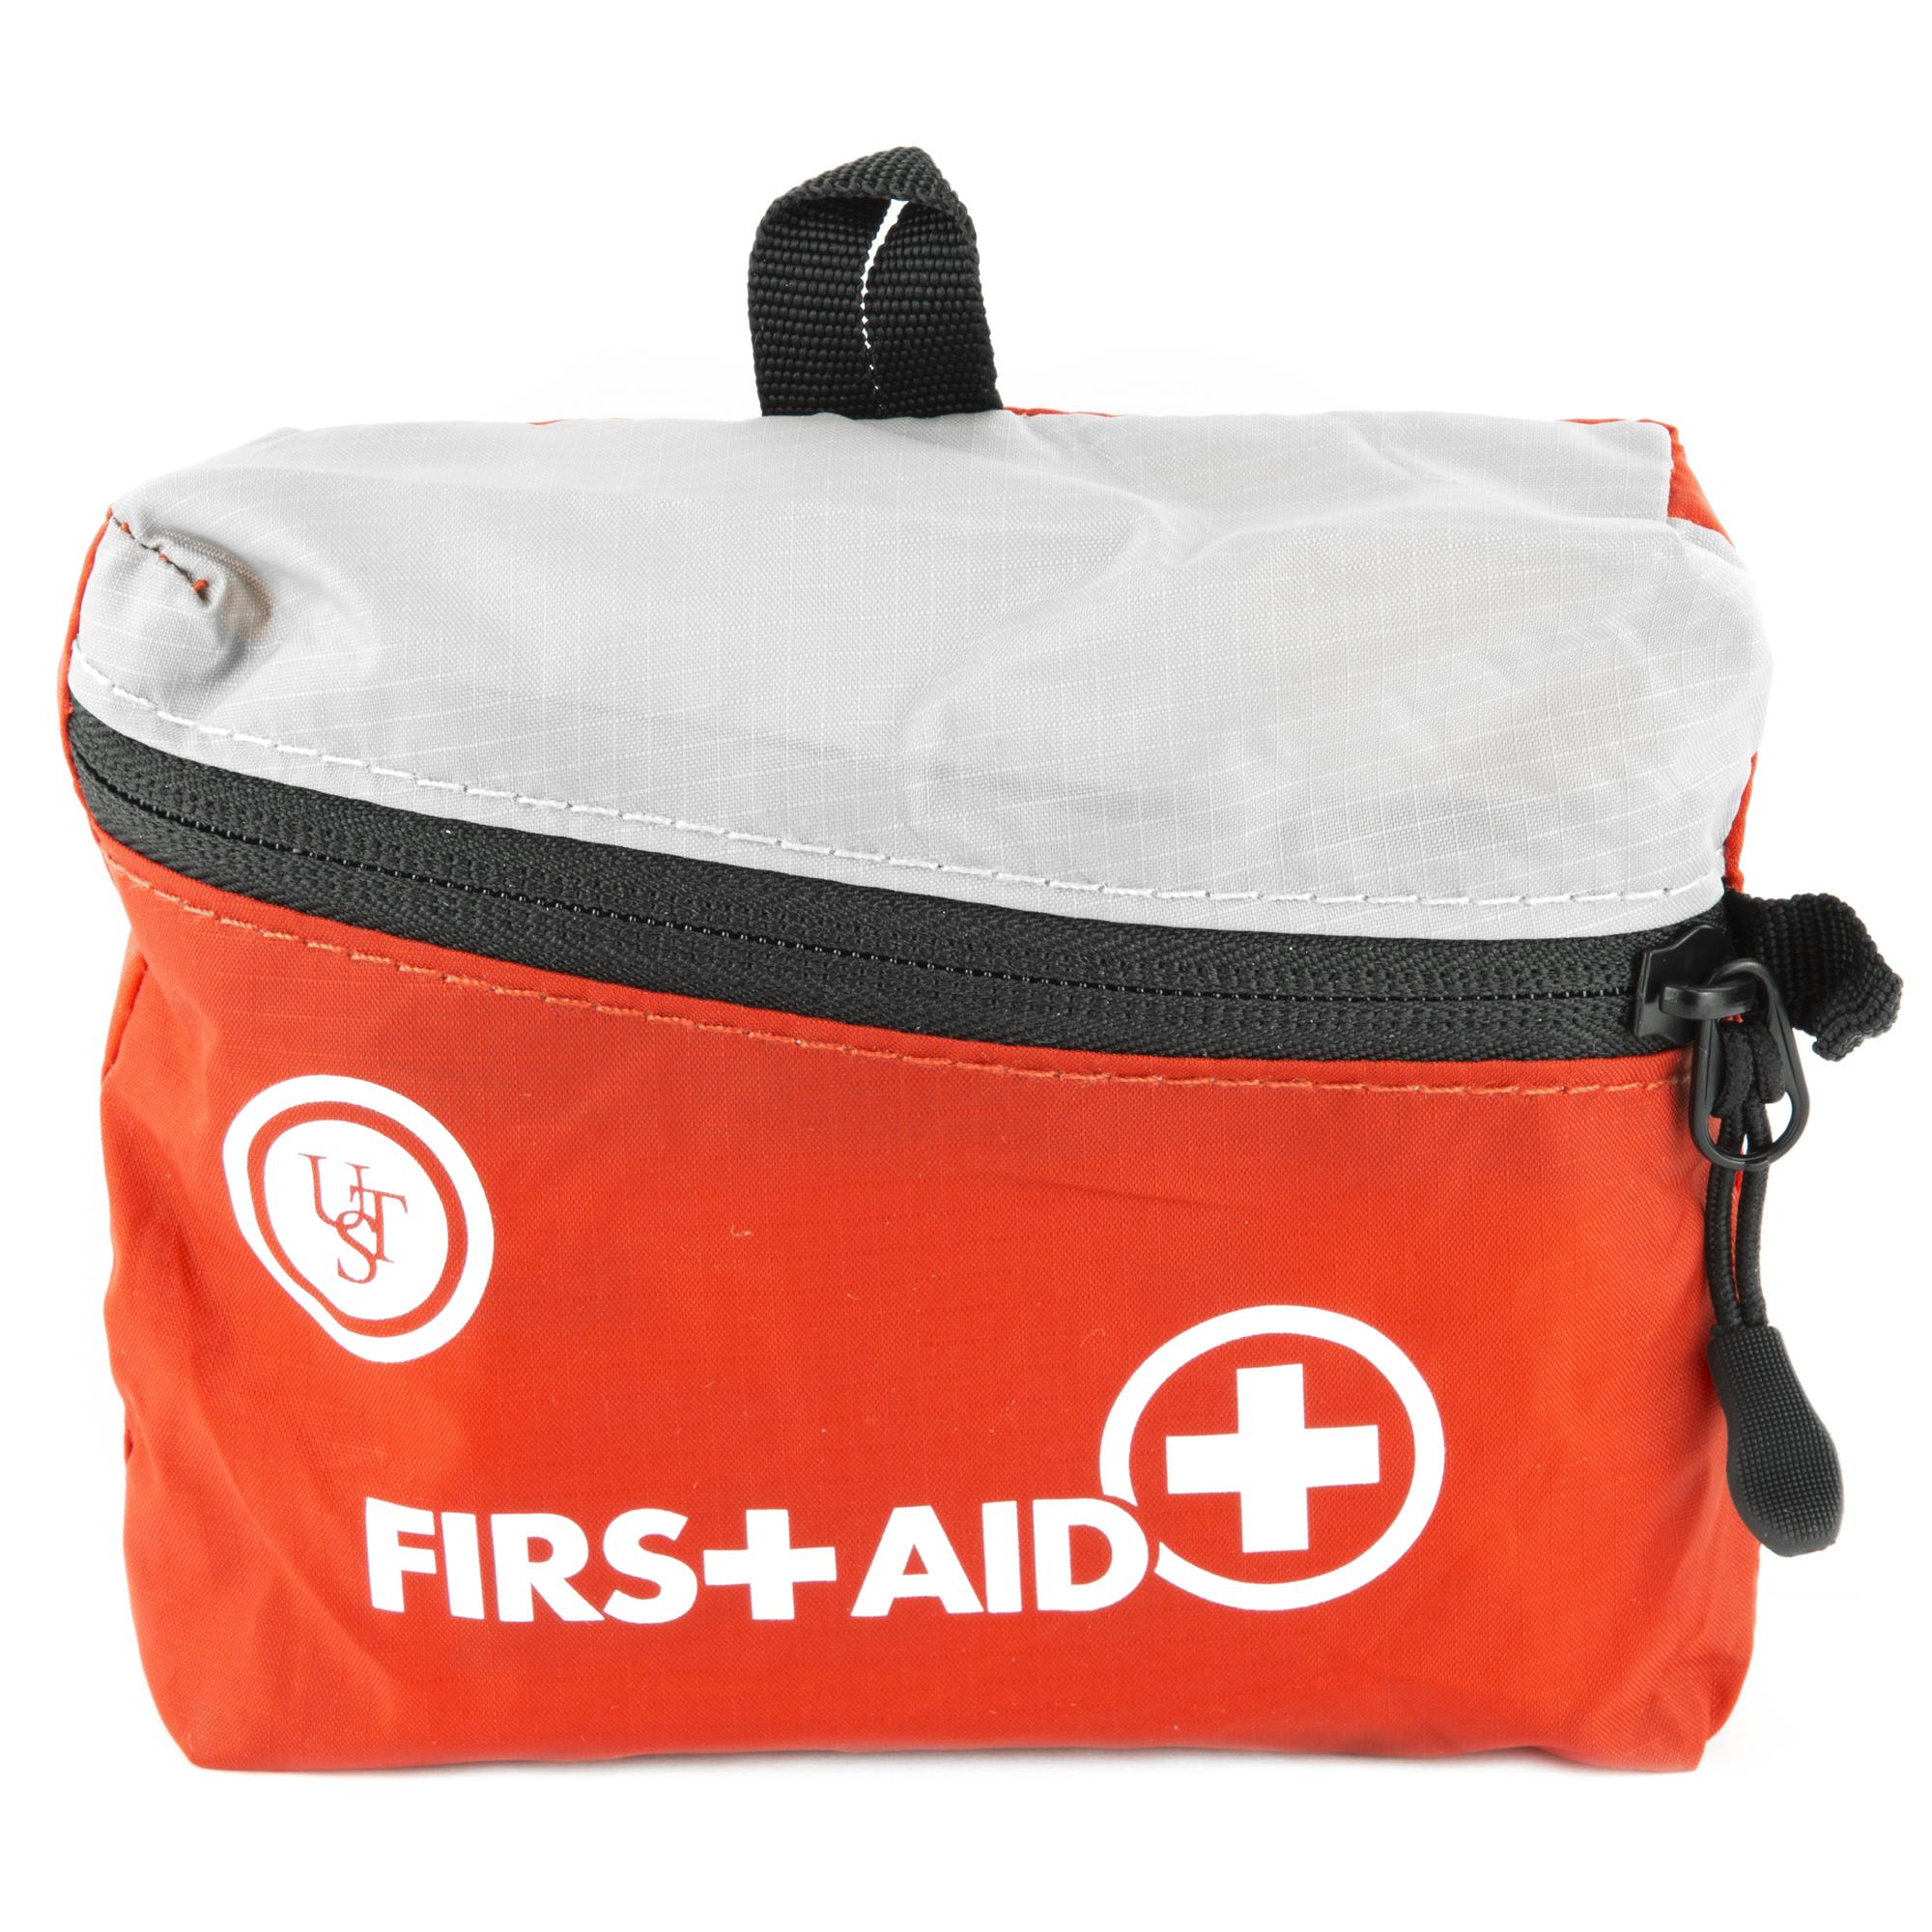 Ust Featherlite First Aid Kit 1.0